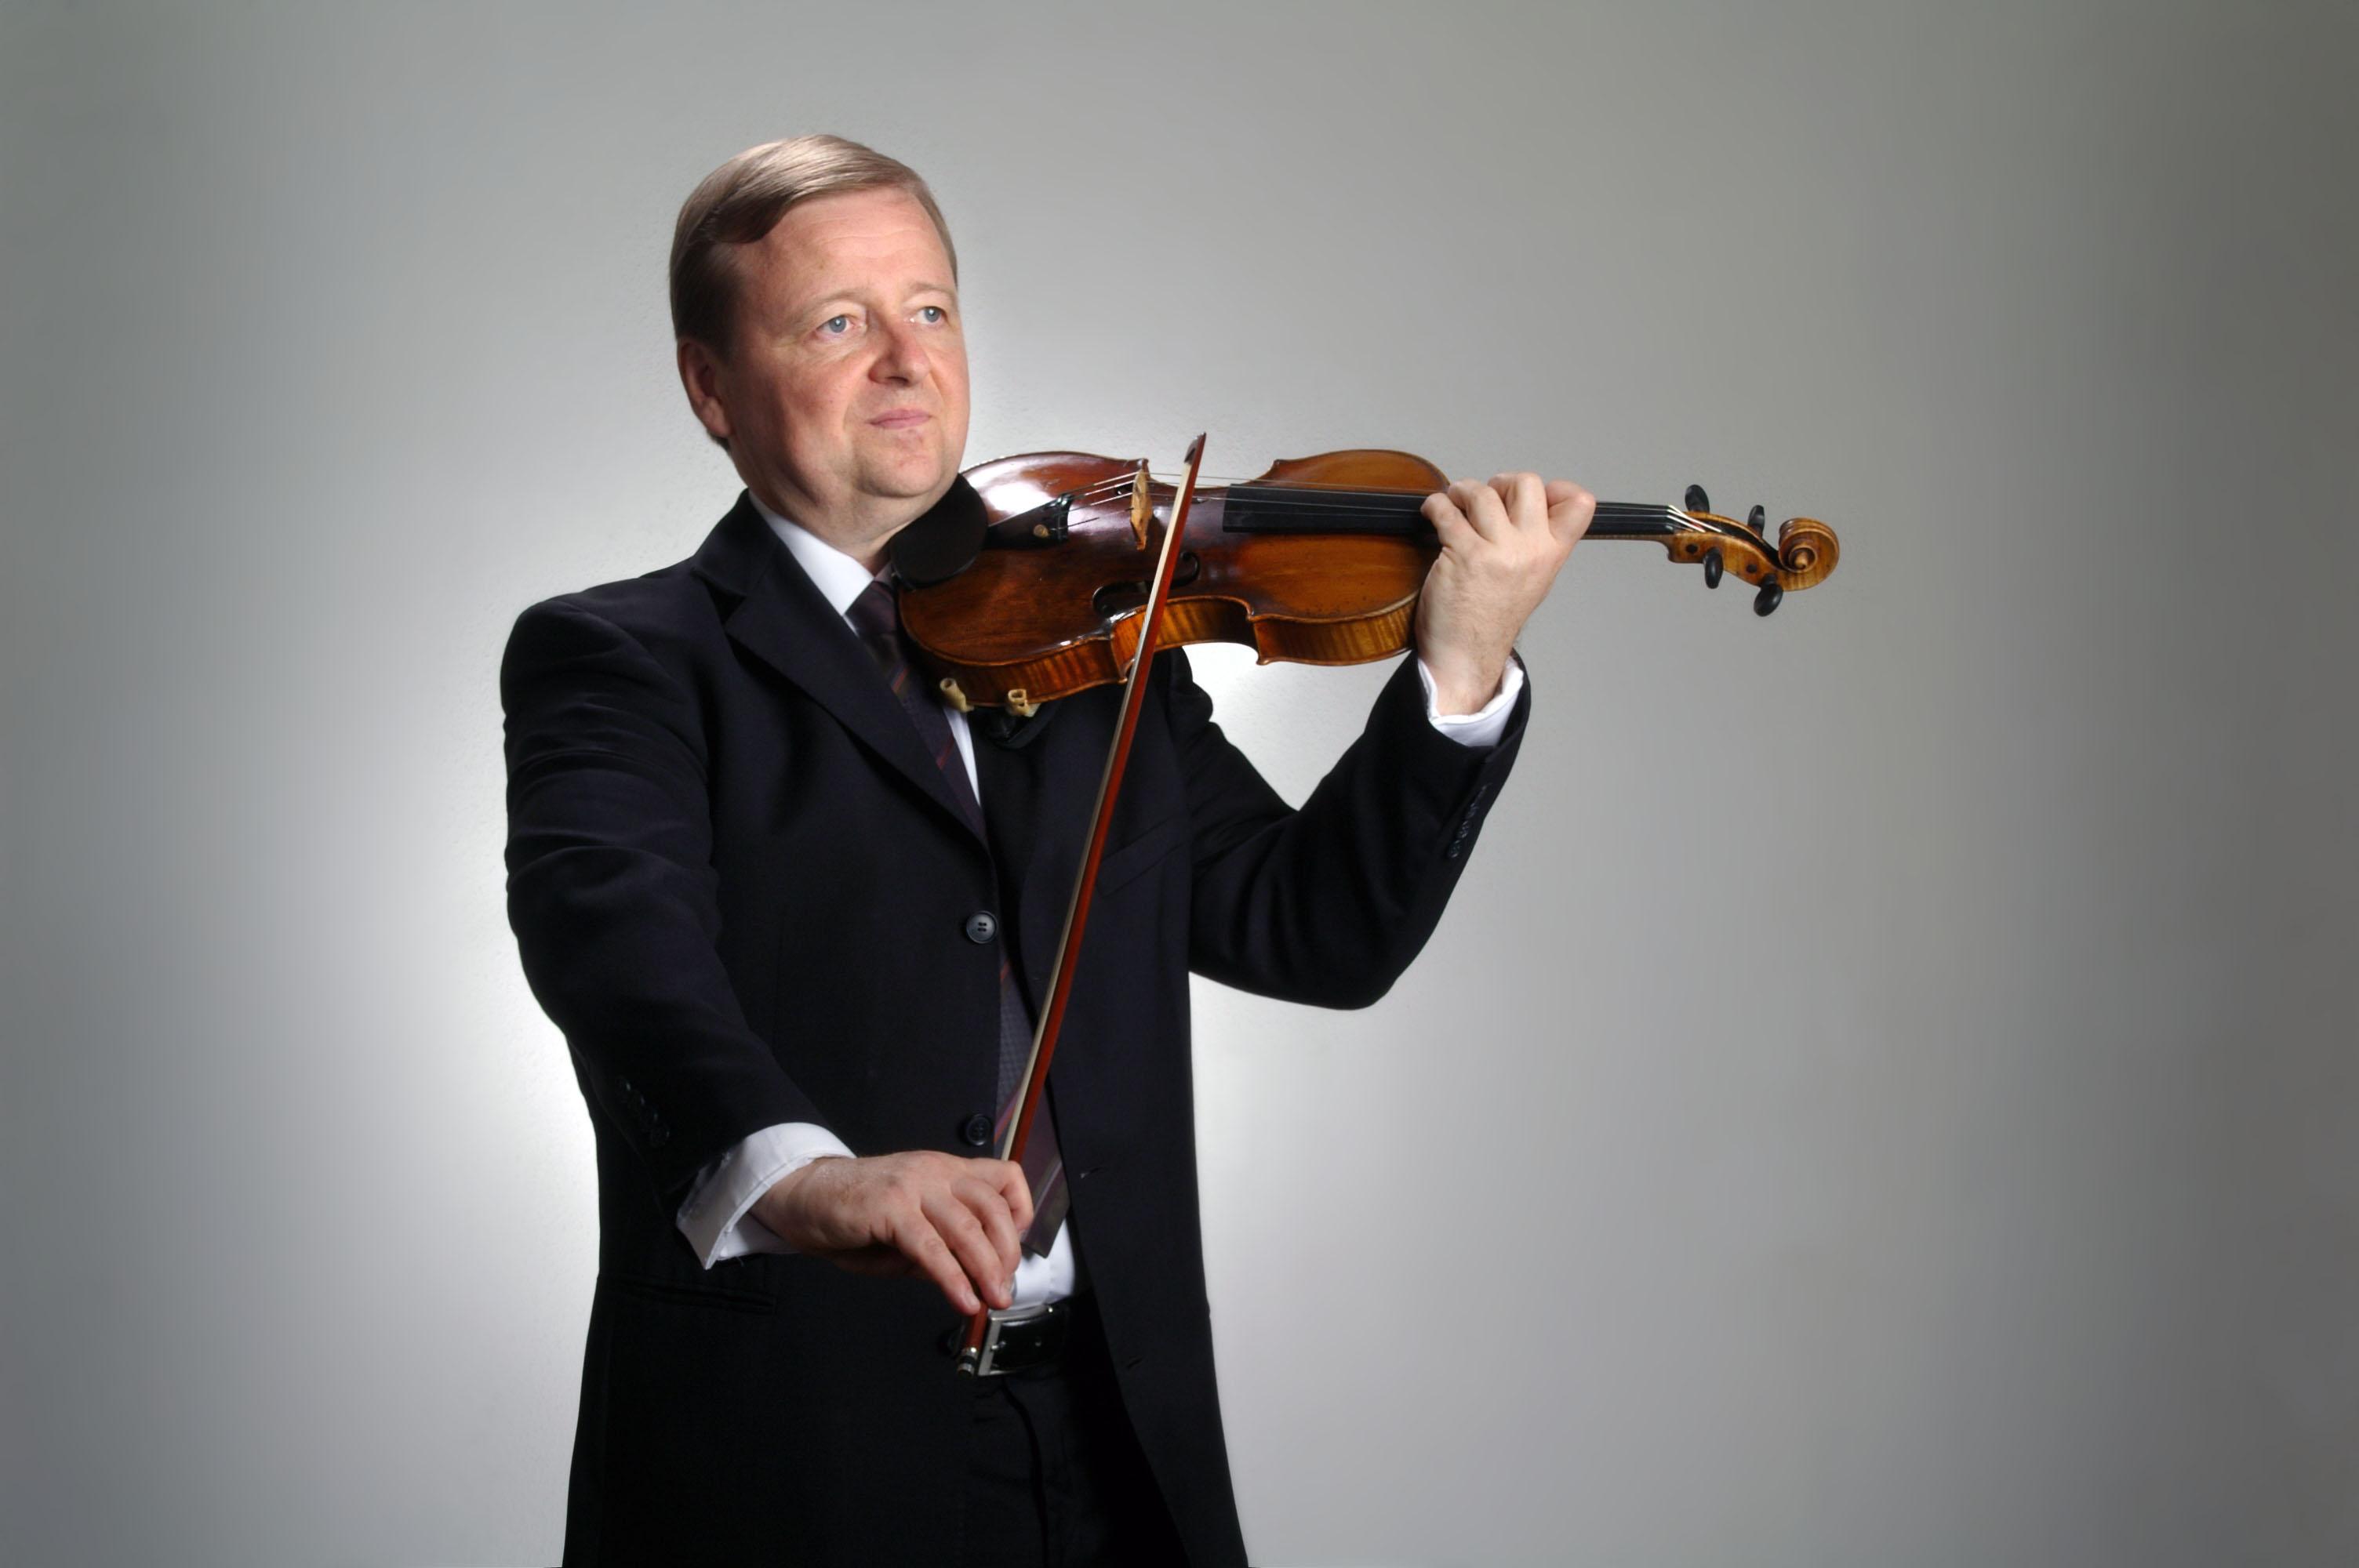 Markus Baumann